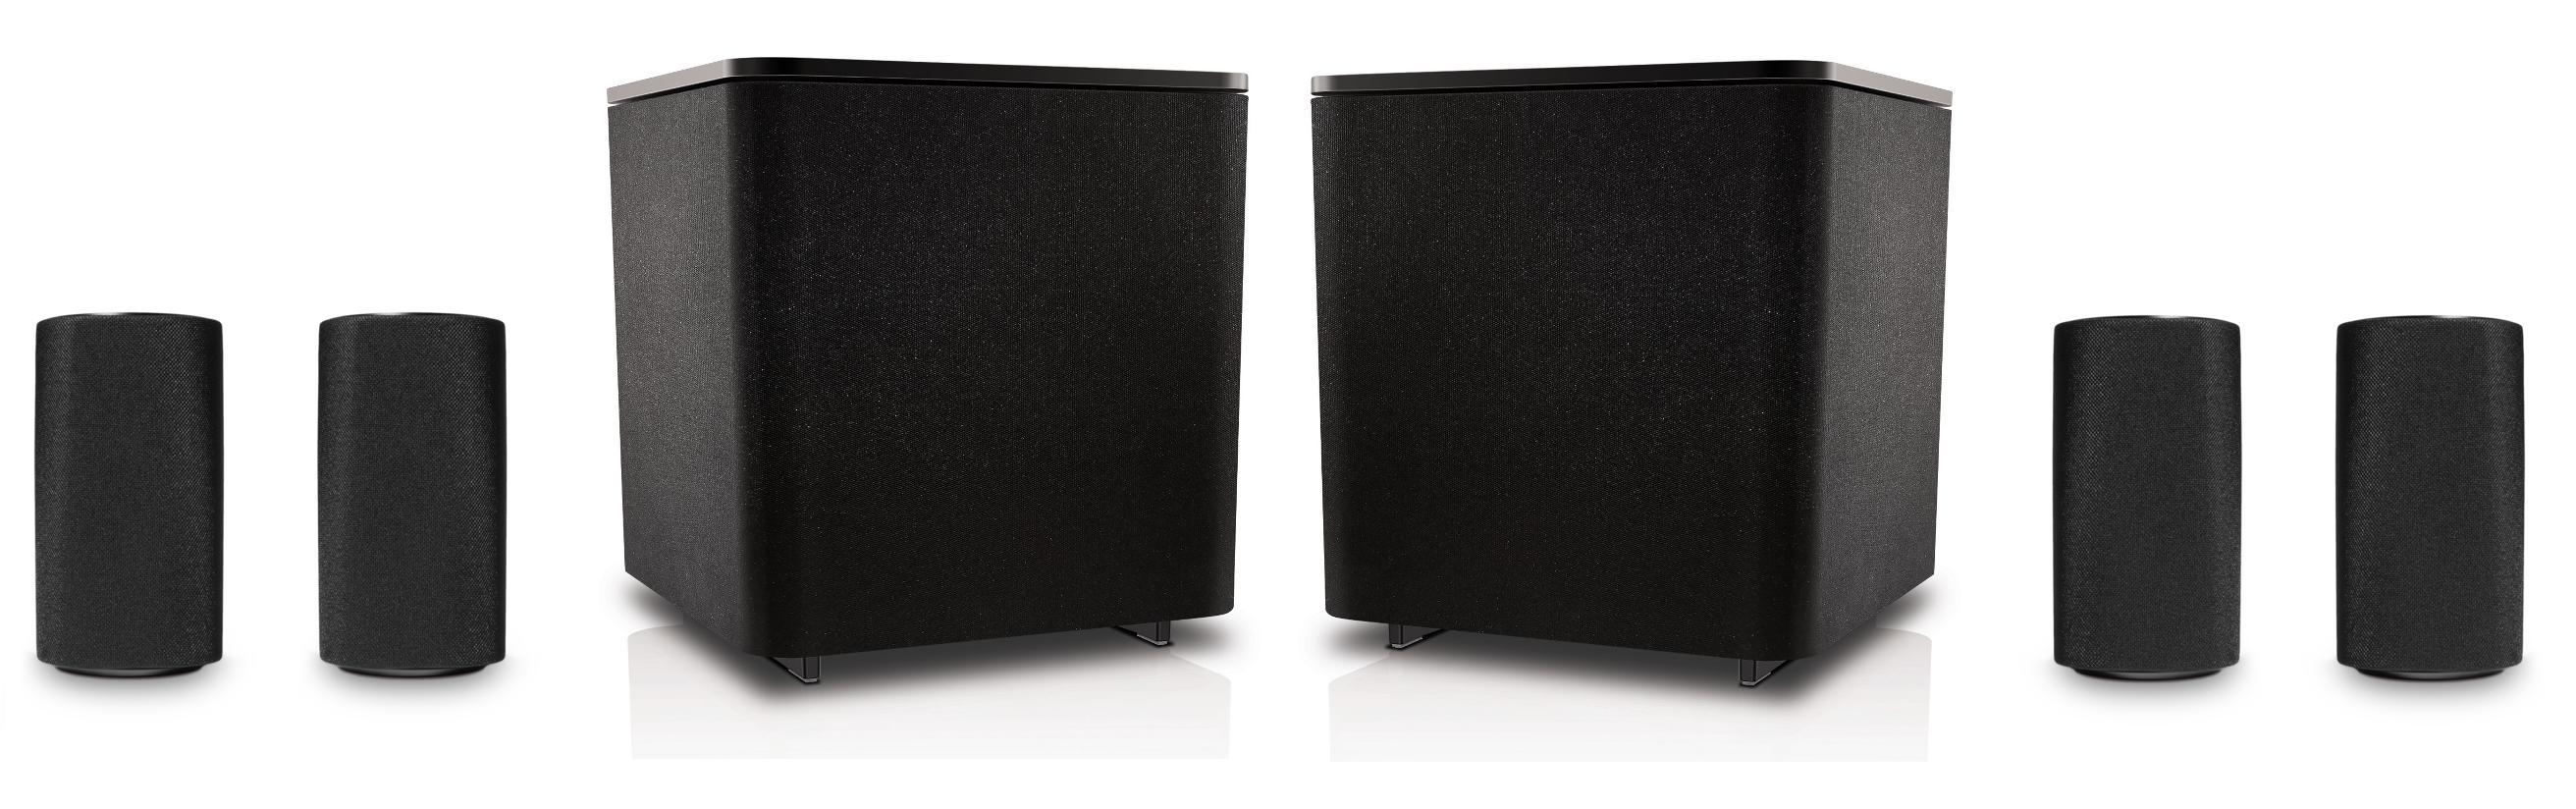 Loewe 5.2 System schwarz | Loewe Aktiv-Lautsprecher bei hifiboehm ...